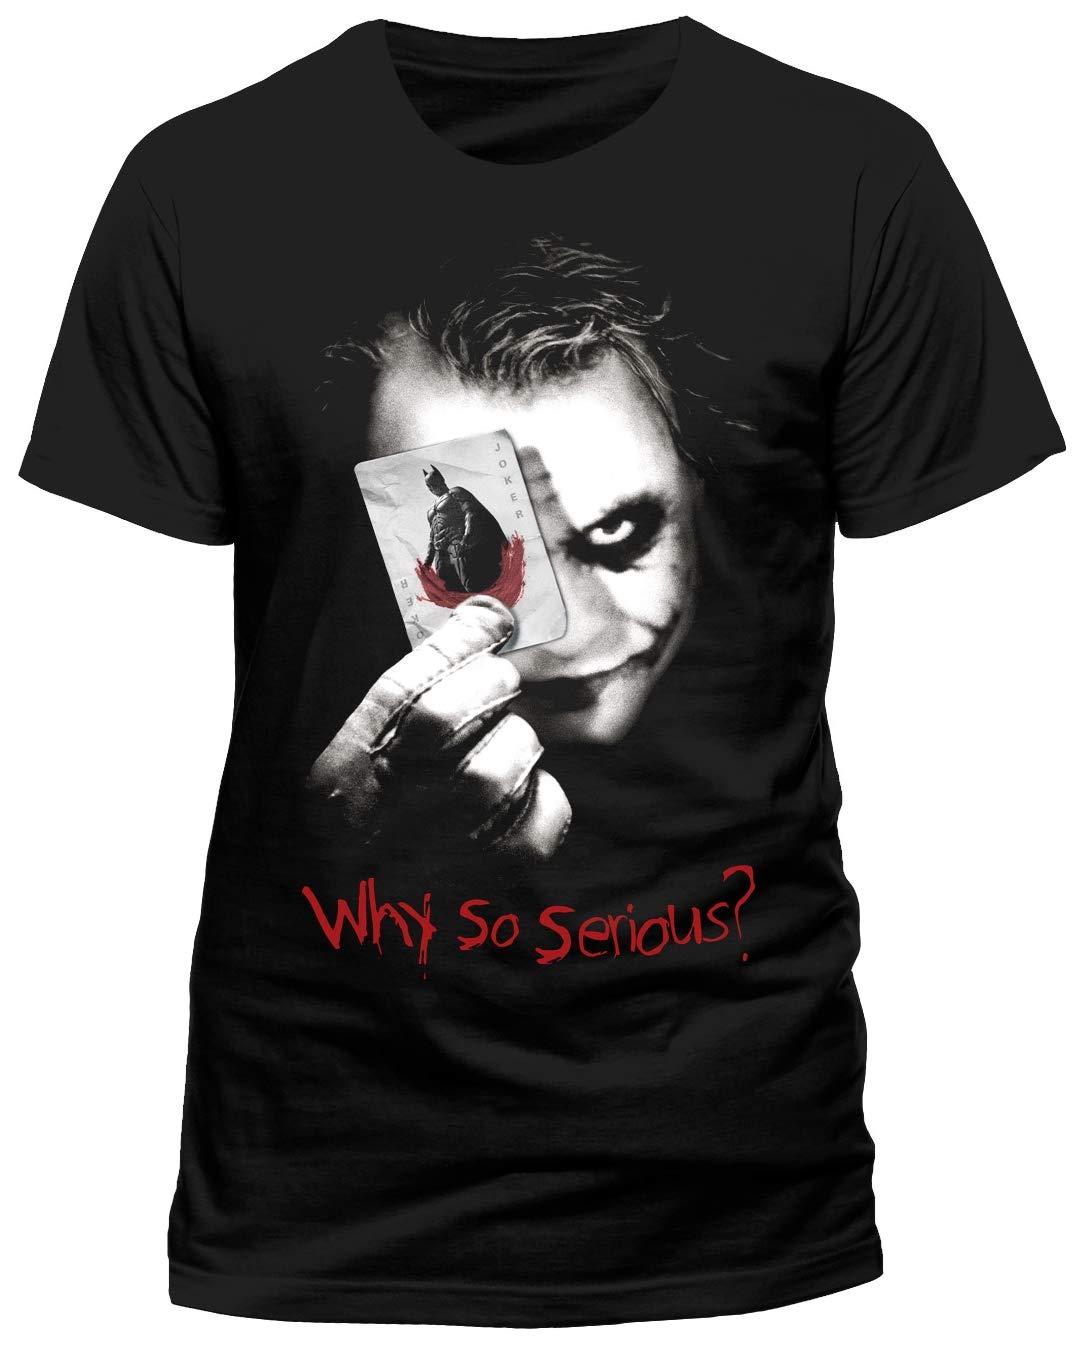 Cid Batman The Dark Knight Why So Serious Tshirt